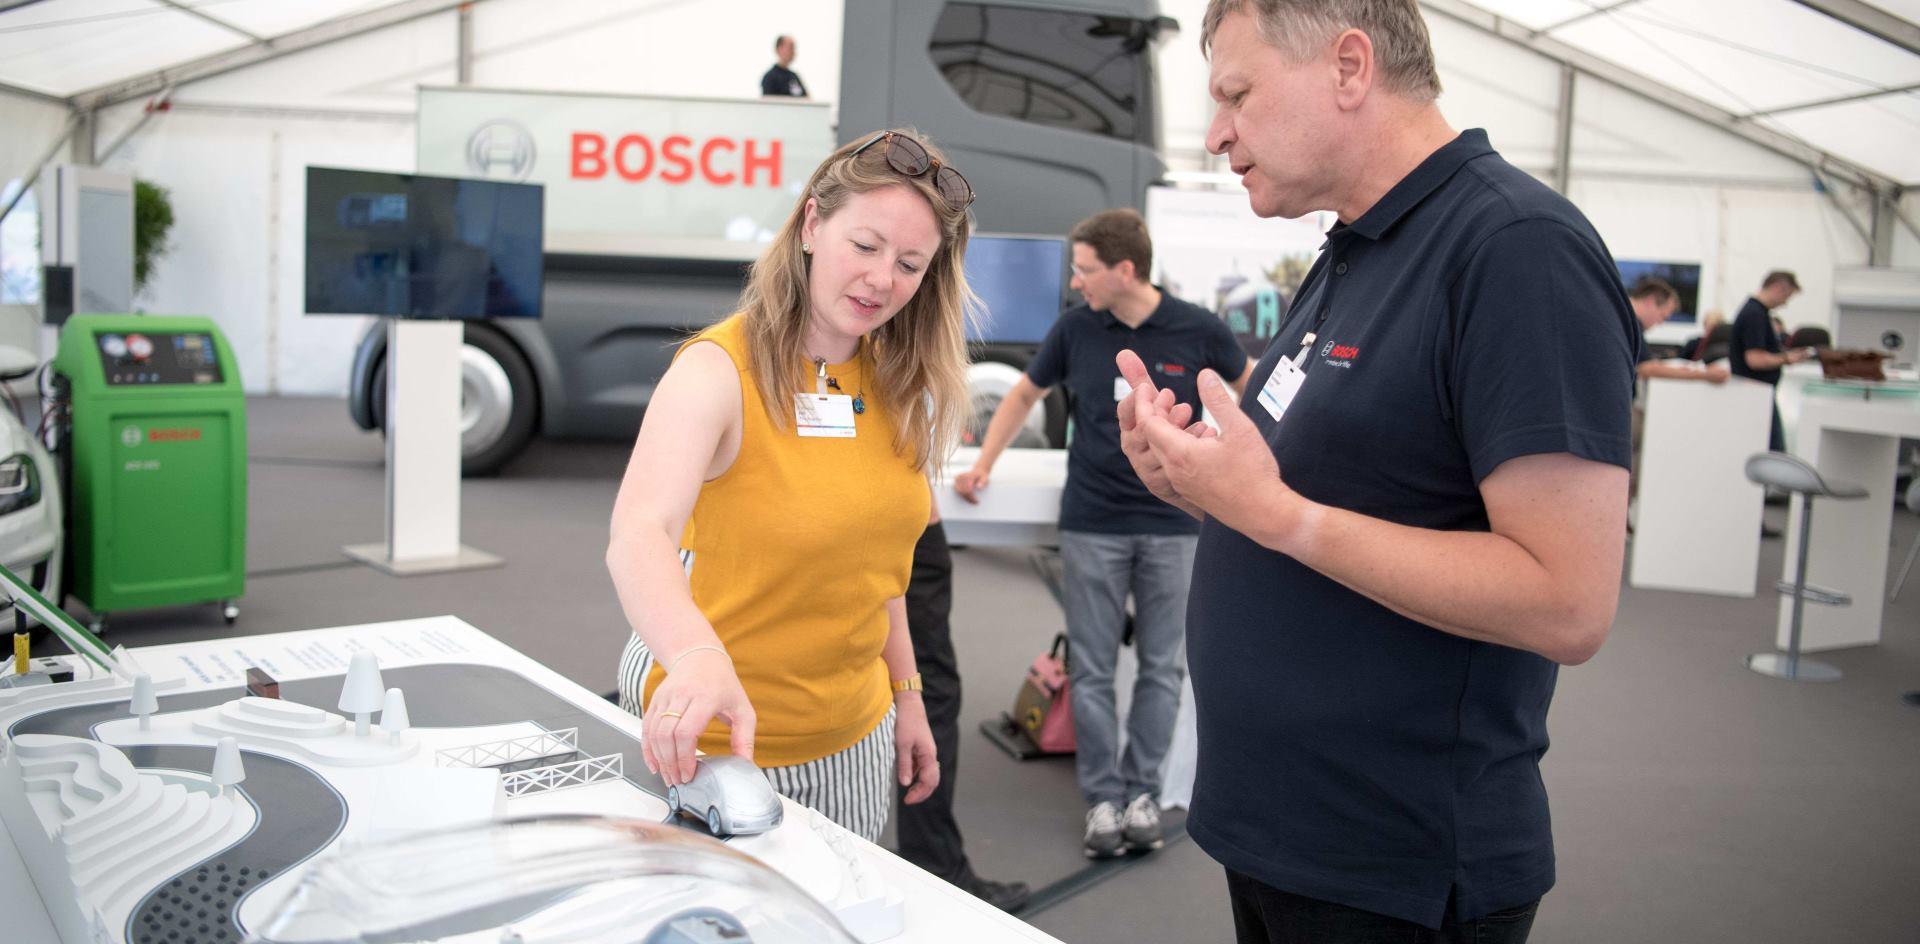 FOTO: Boscheva vizija budućnosti urbane mobilnosti